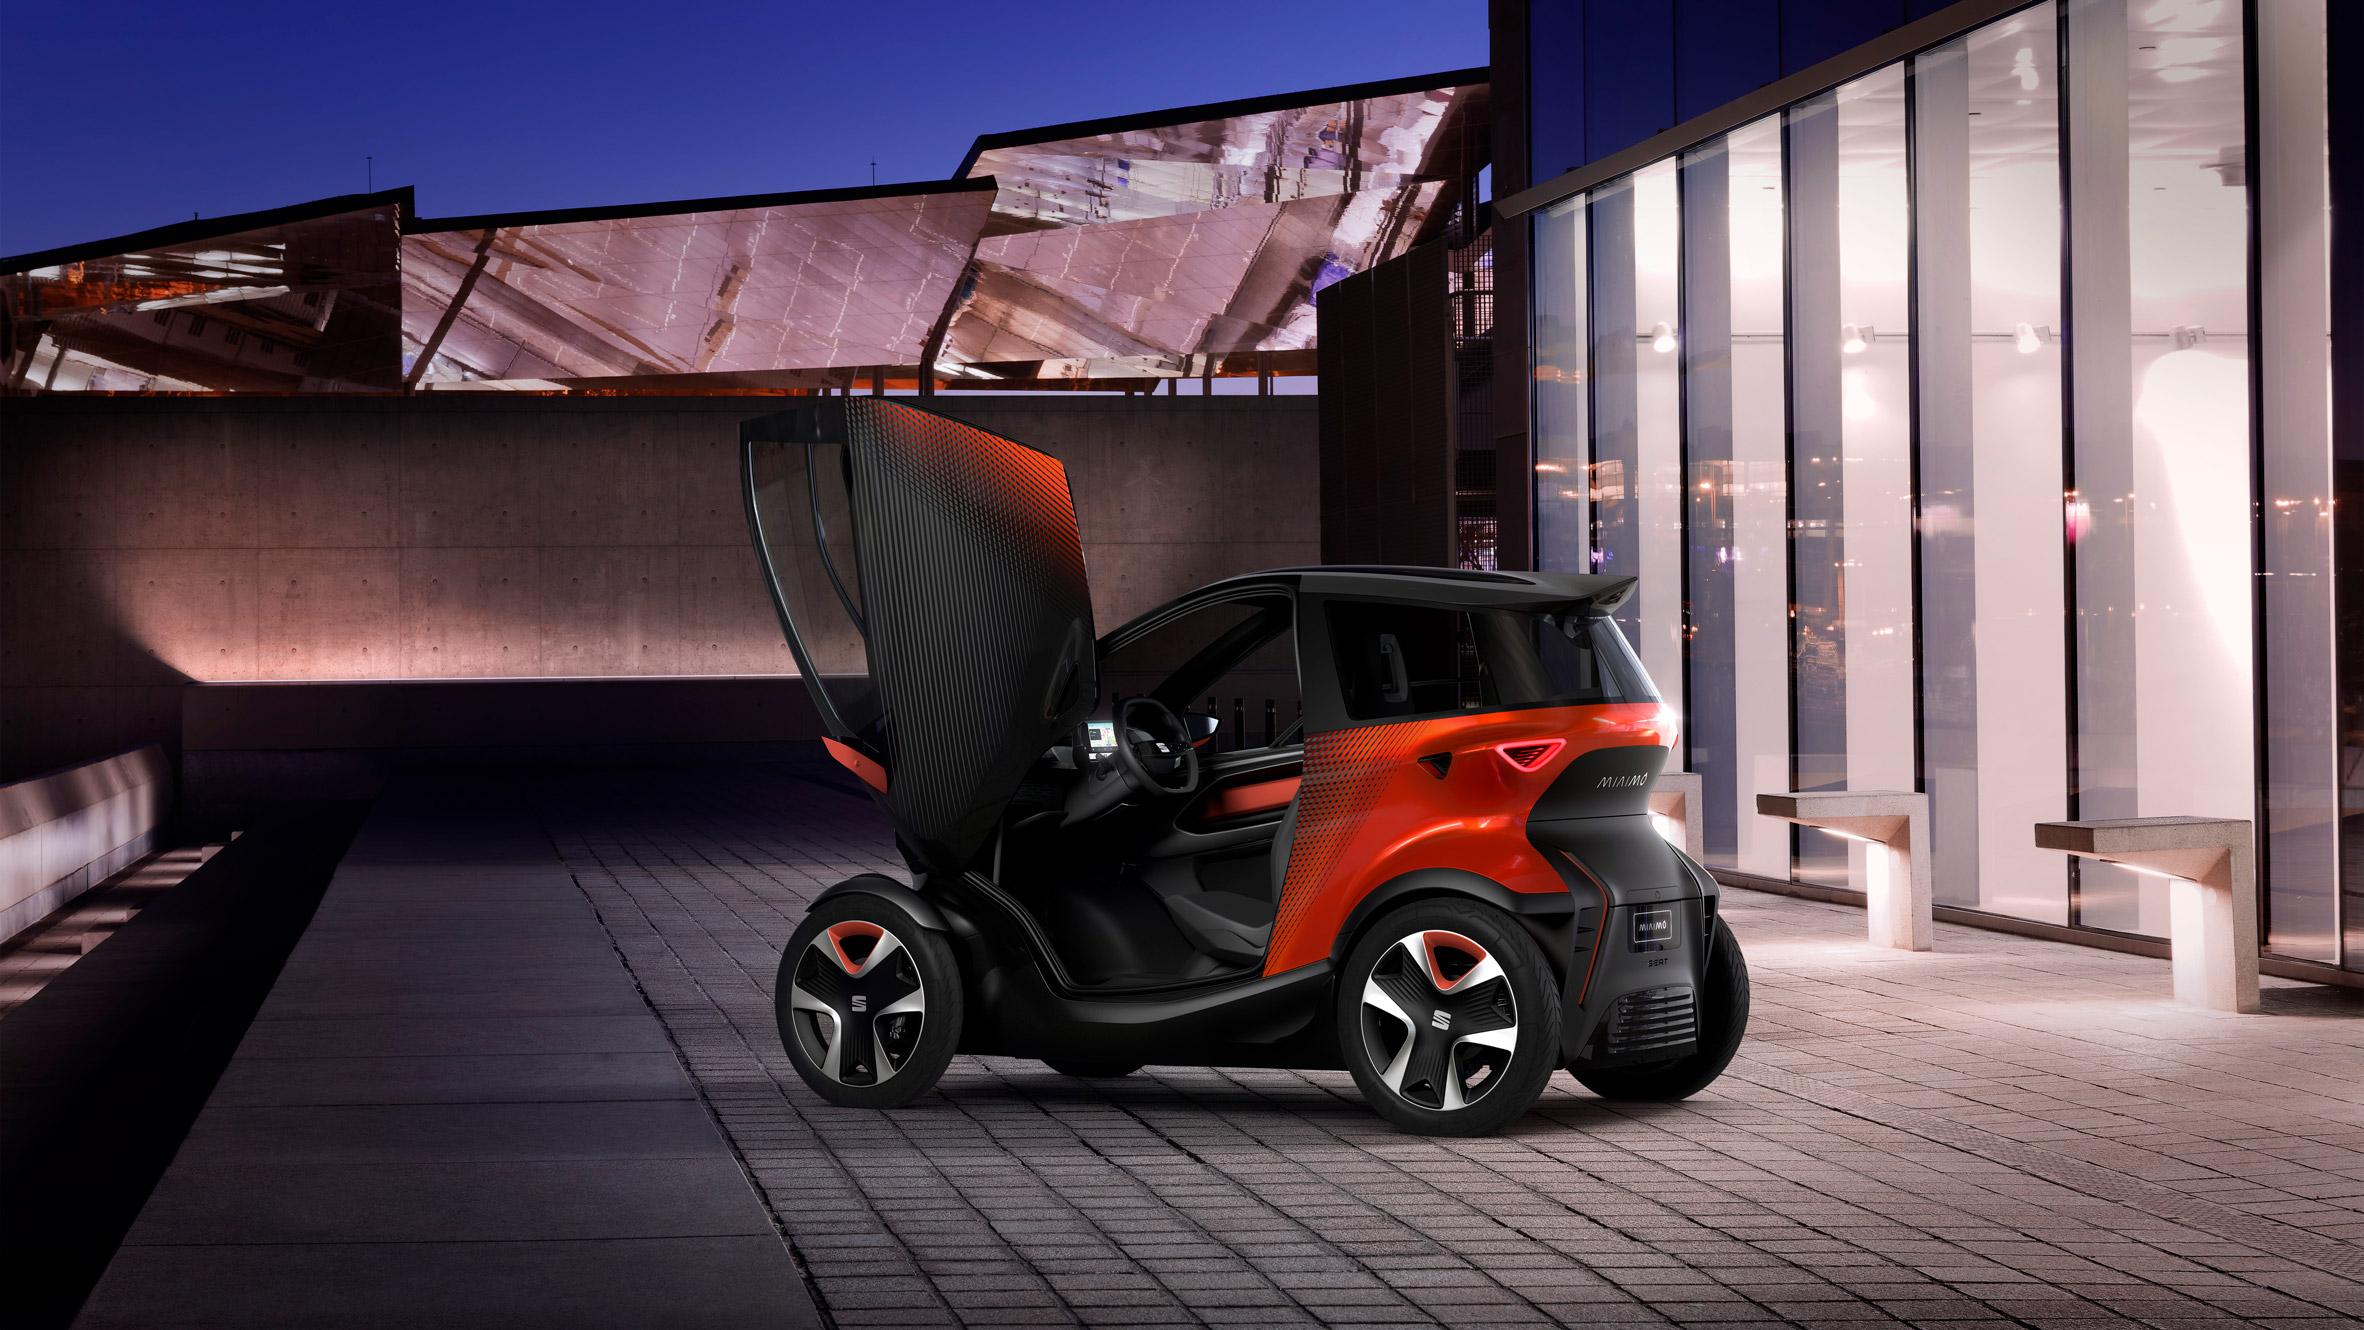 10 best electric cars at Geneva Motor Show 2019